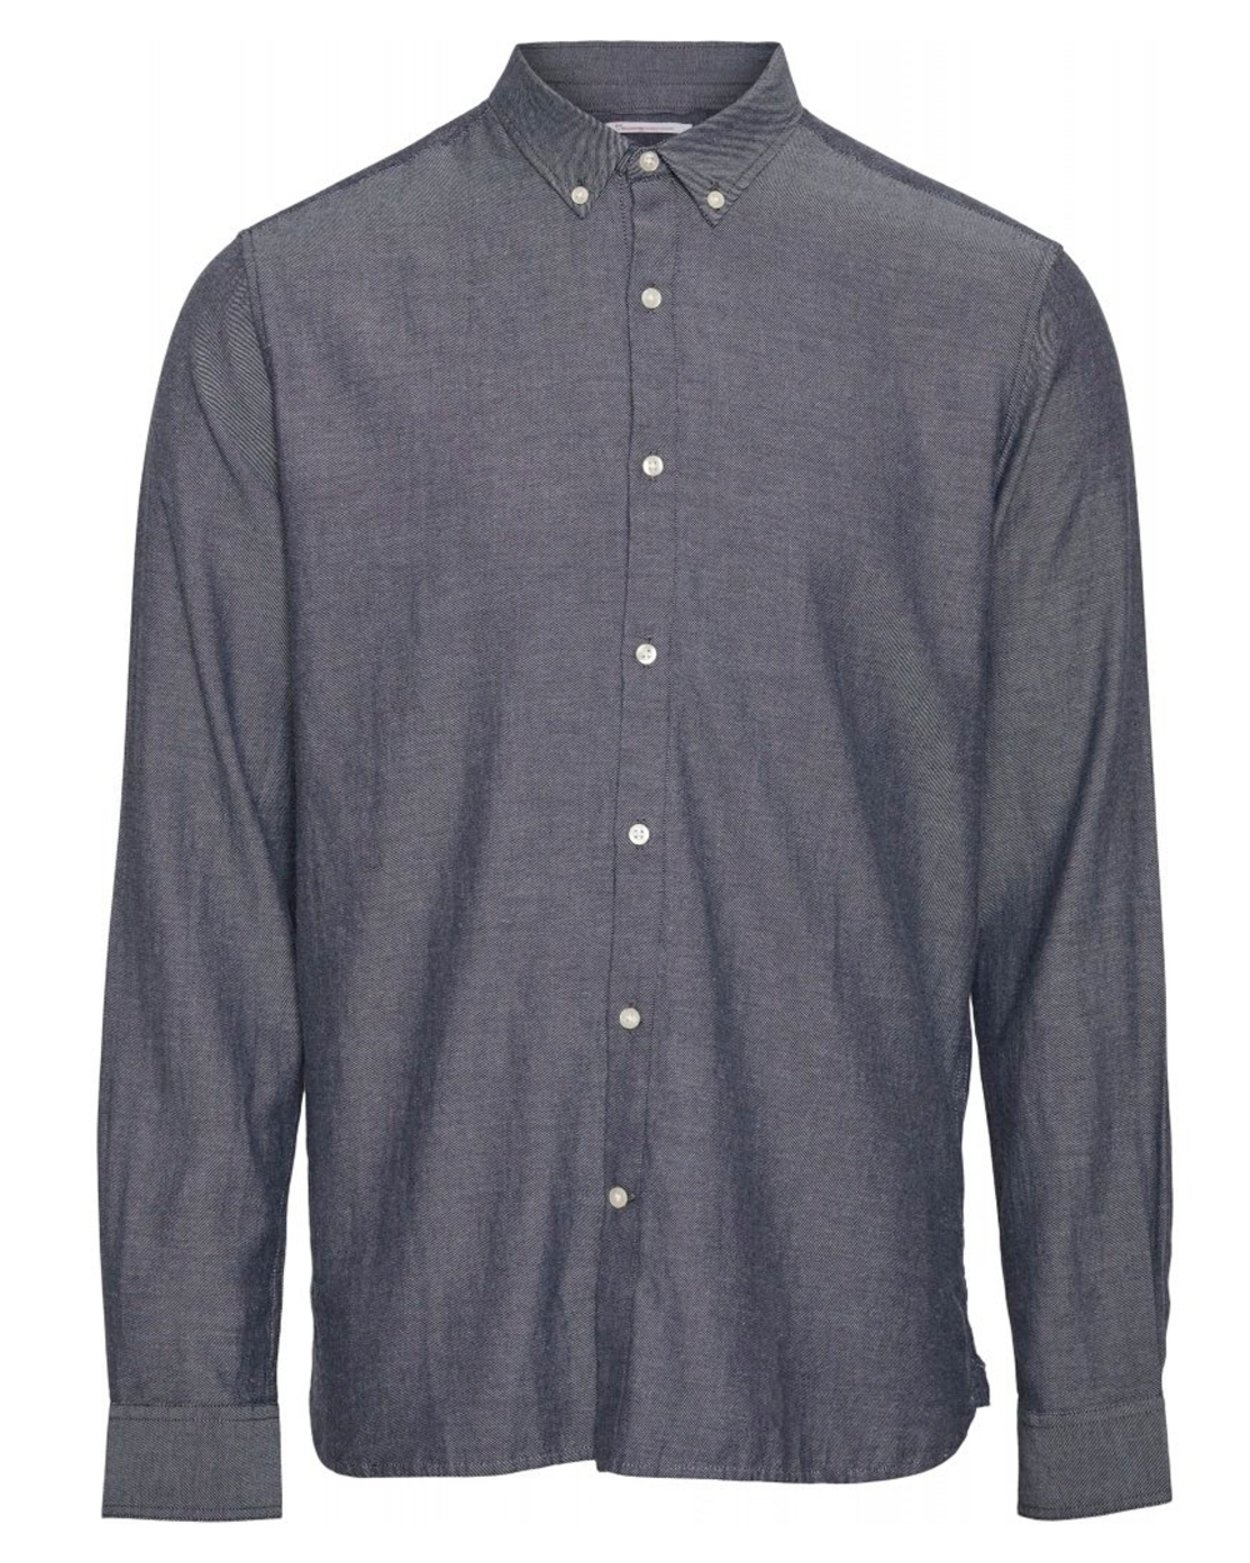 Elder Long Sleeve Twill Shirt